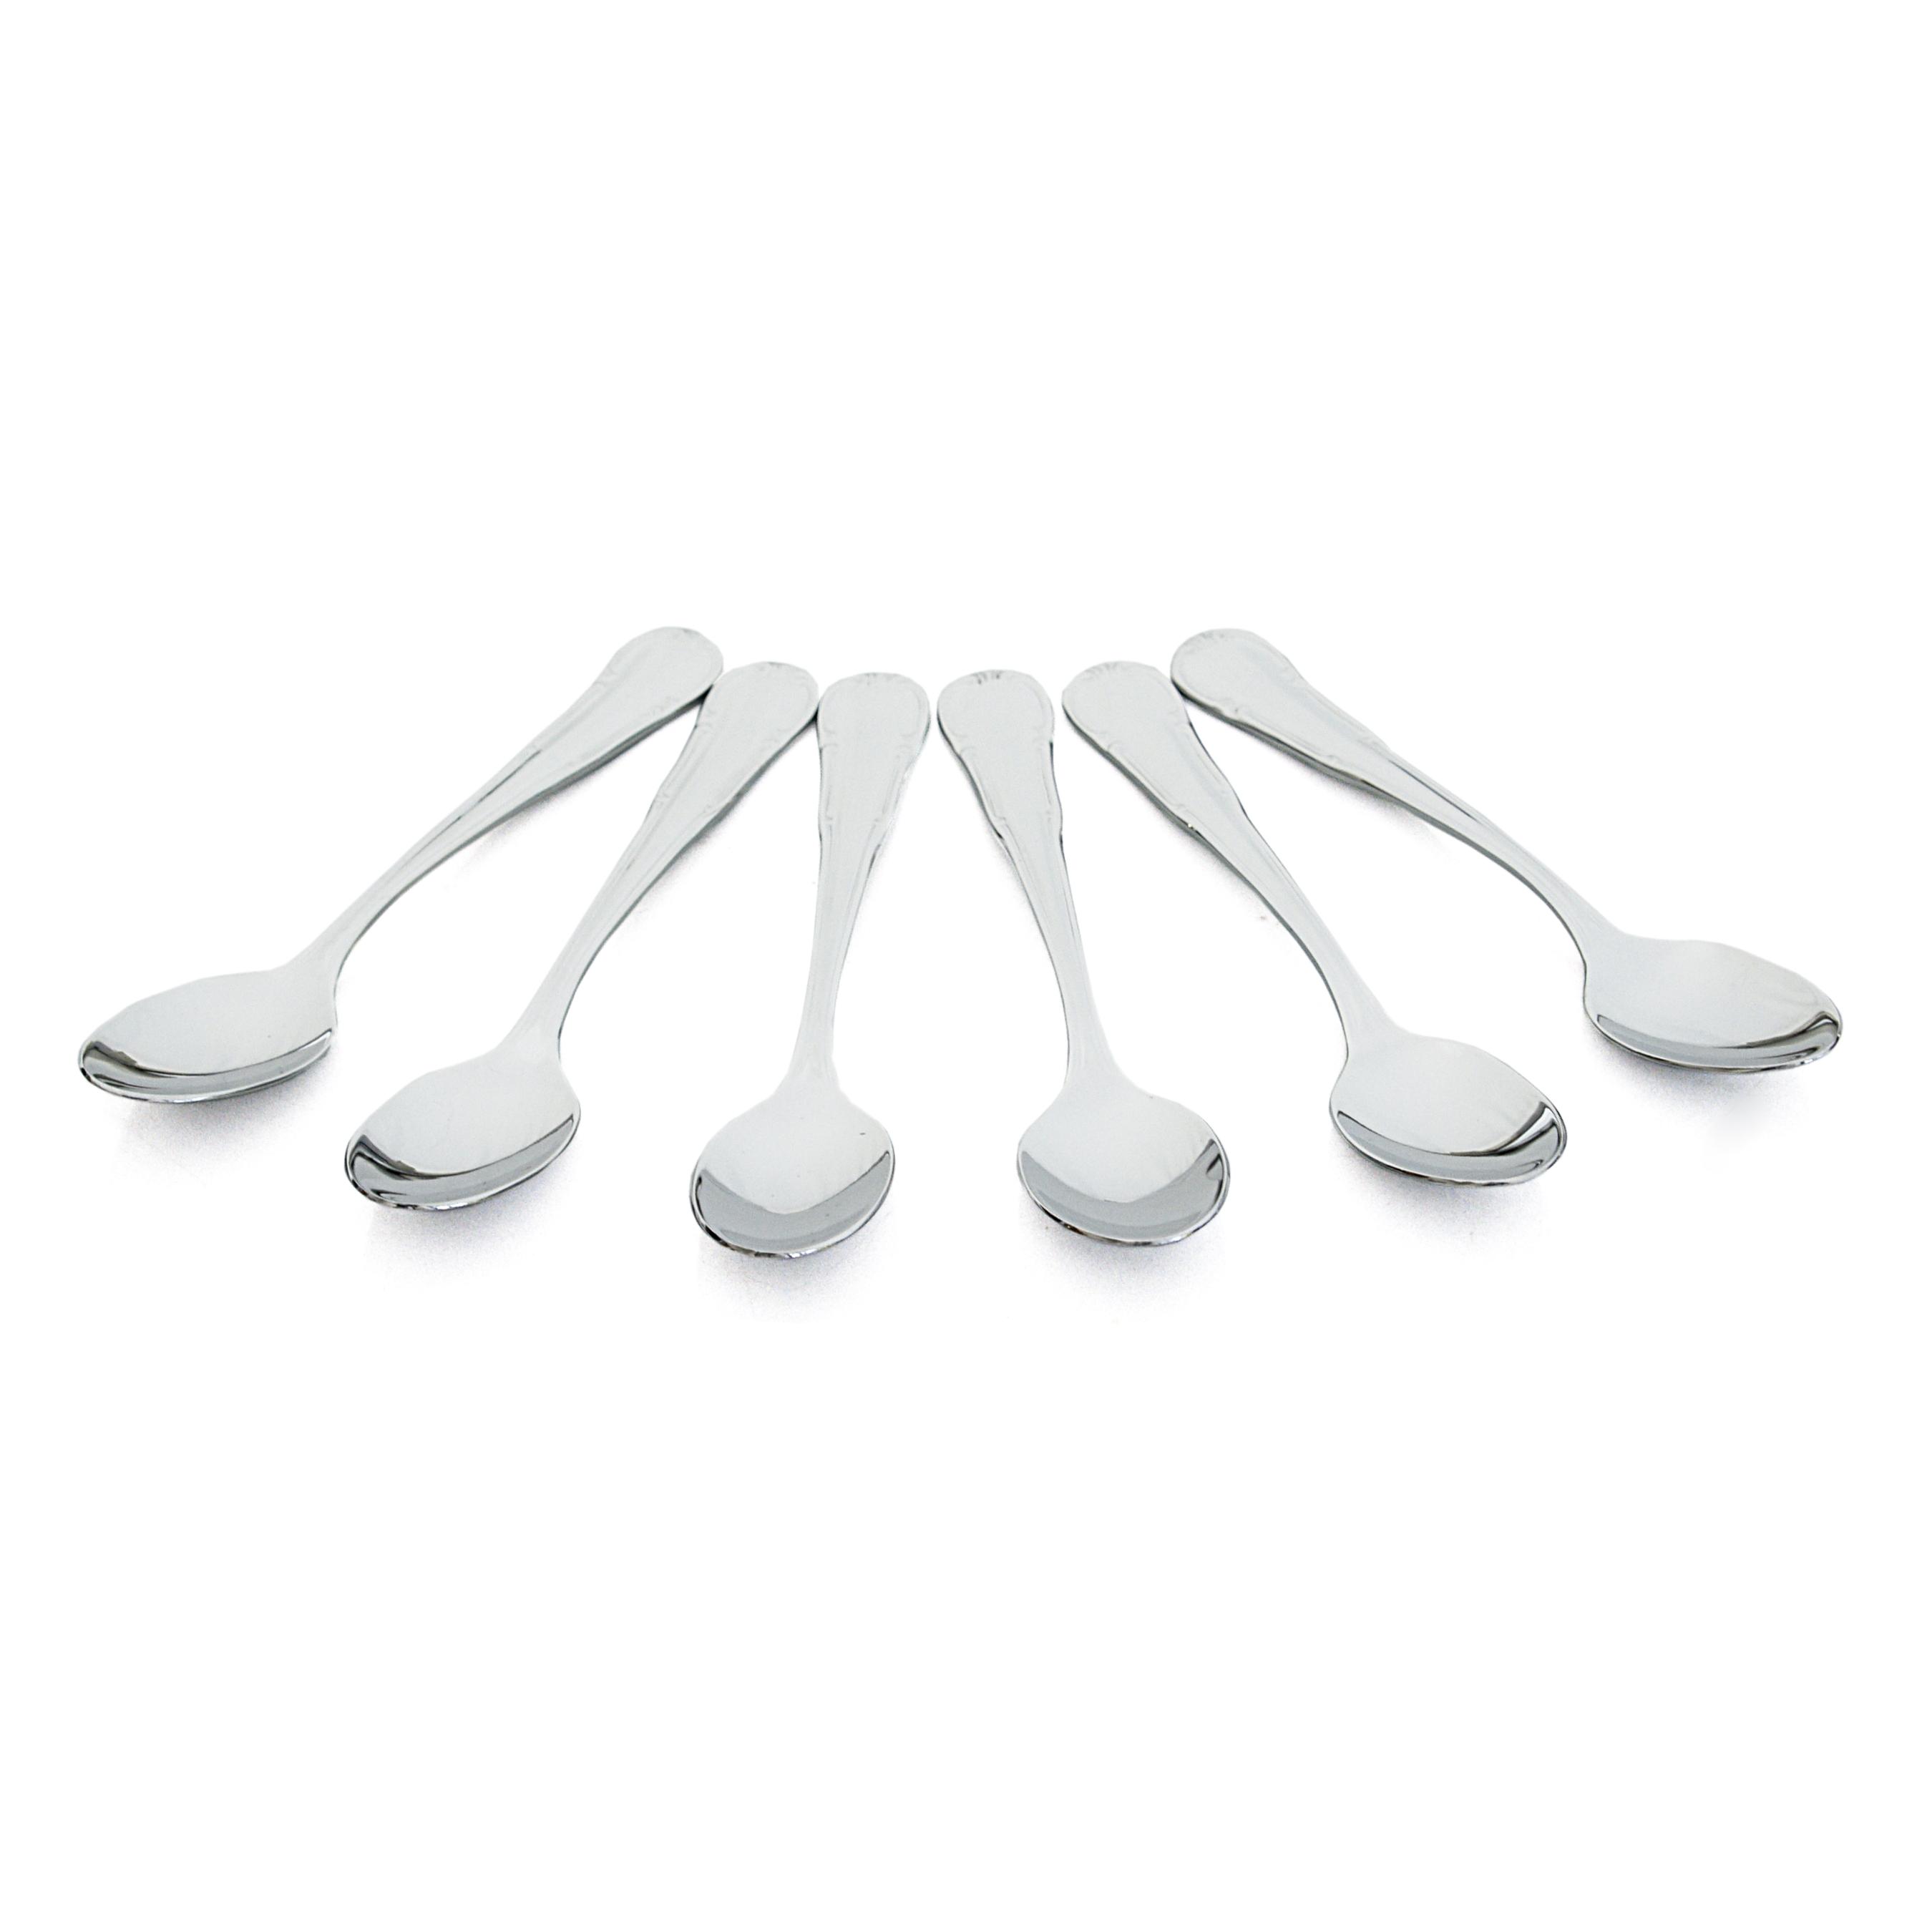 WMF Barock Cromargan 18/10 Stainless Steel Espresso Spoon, Set of 6